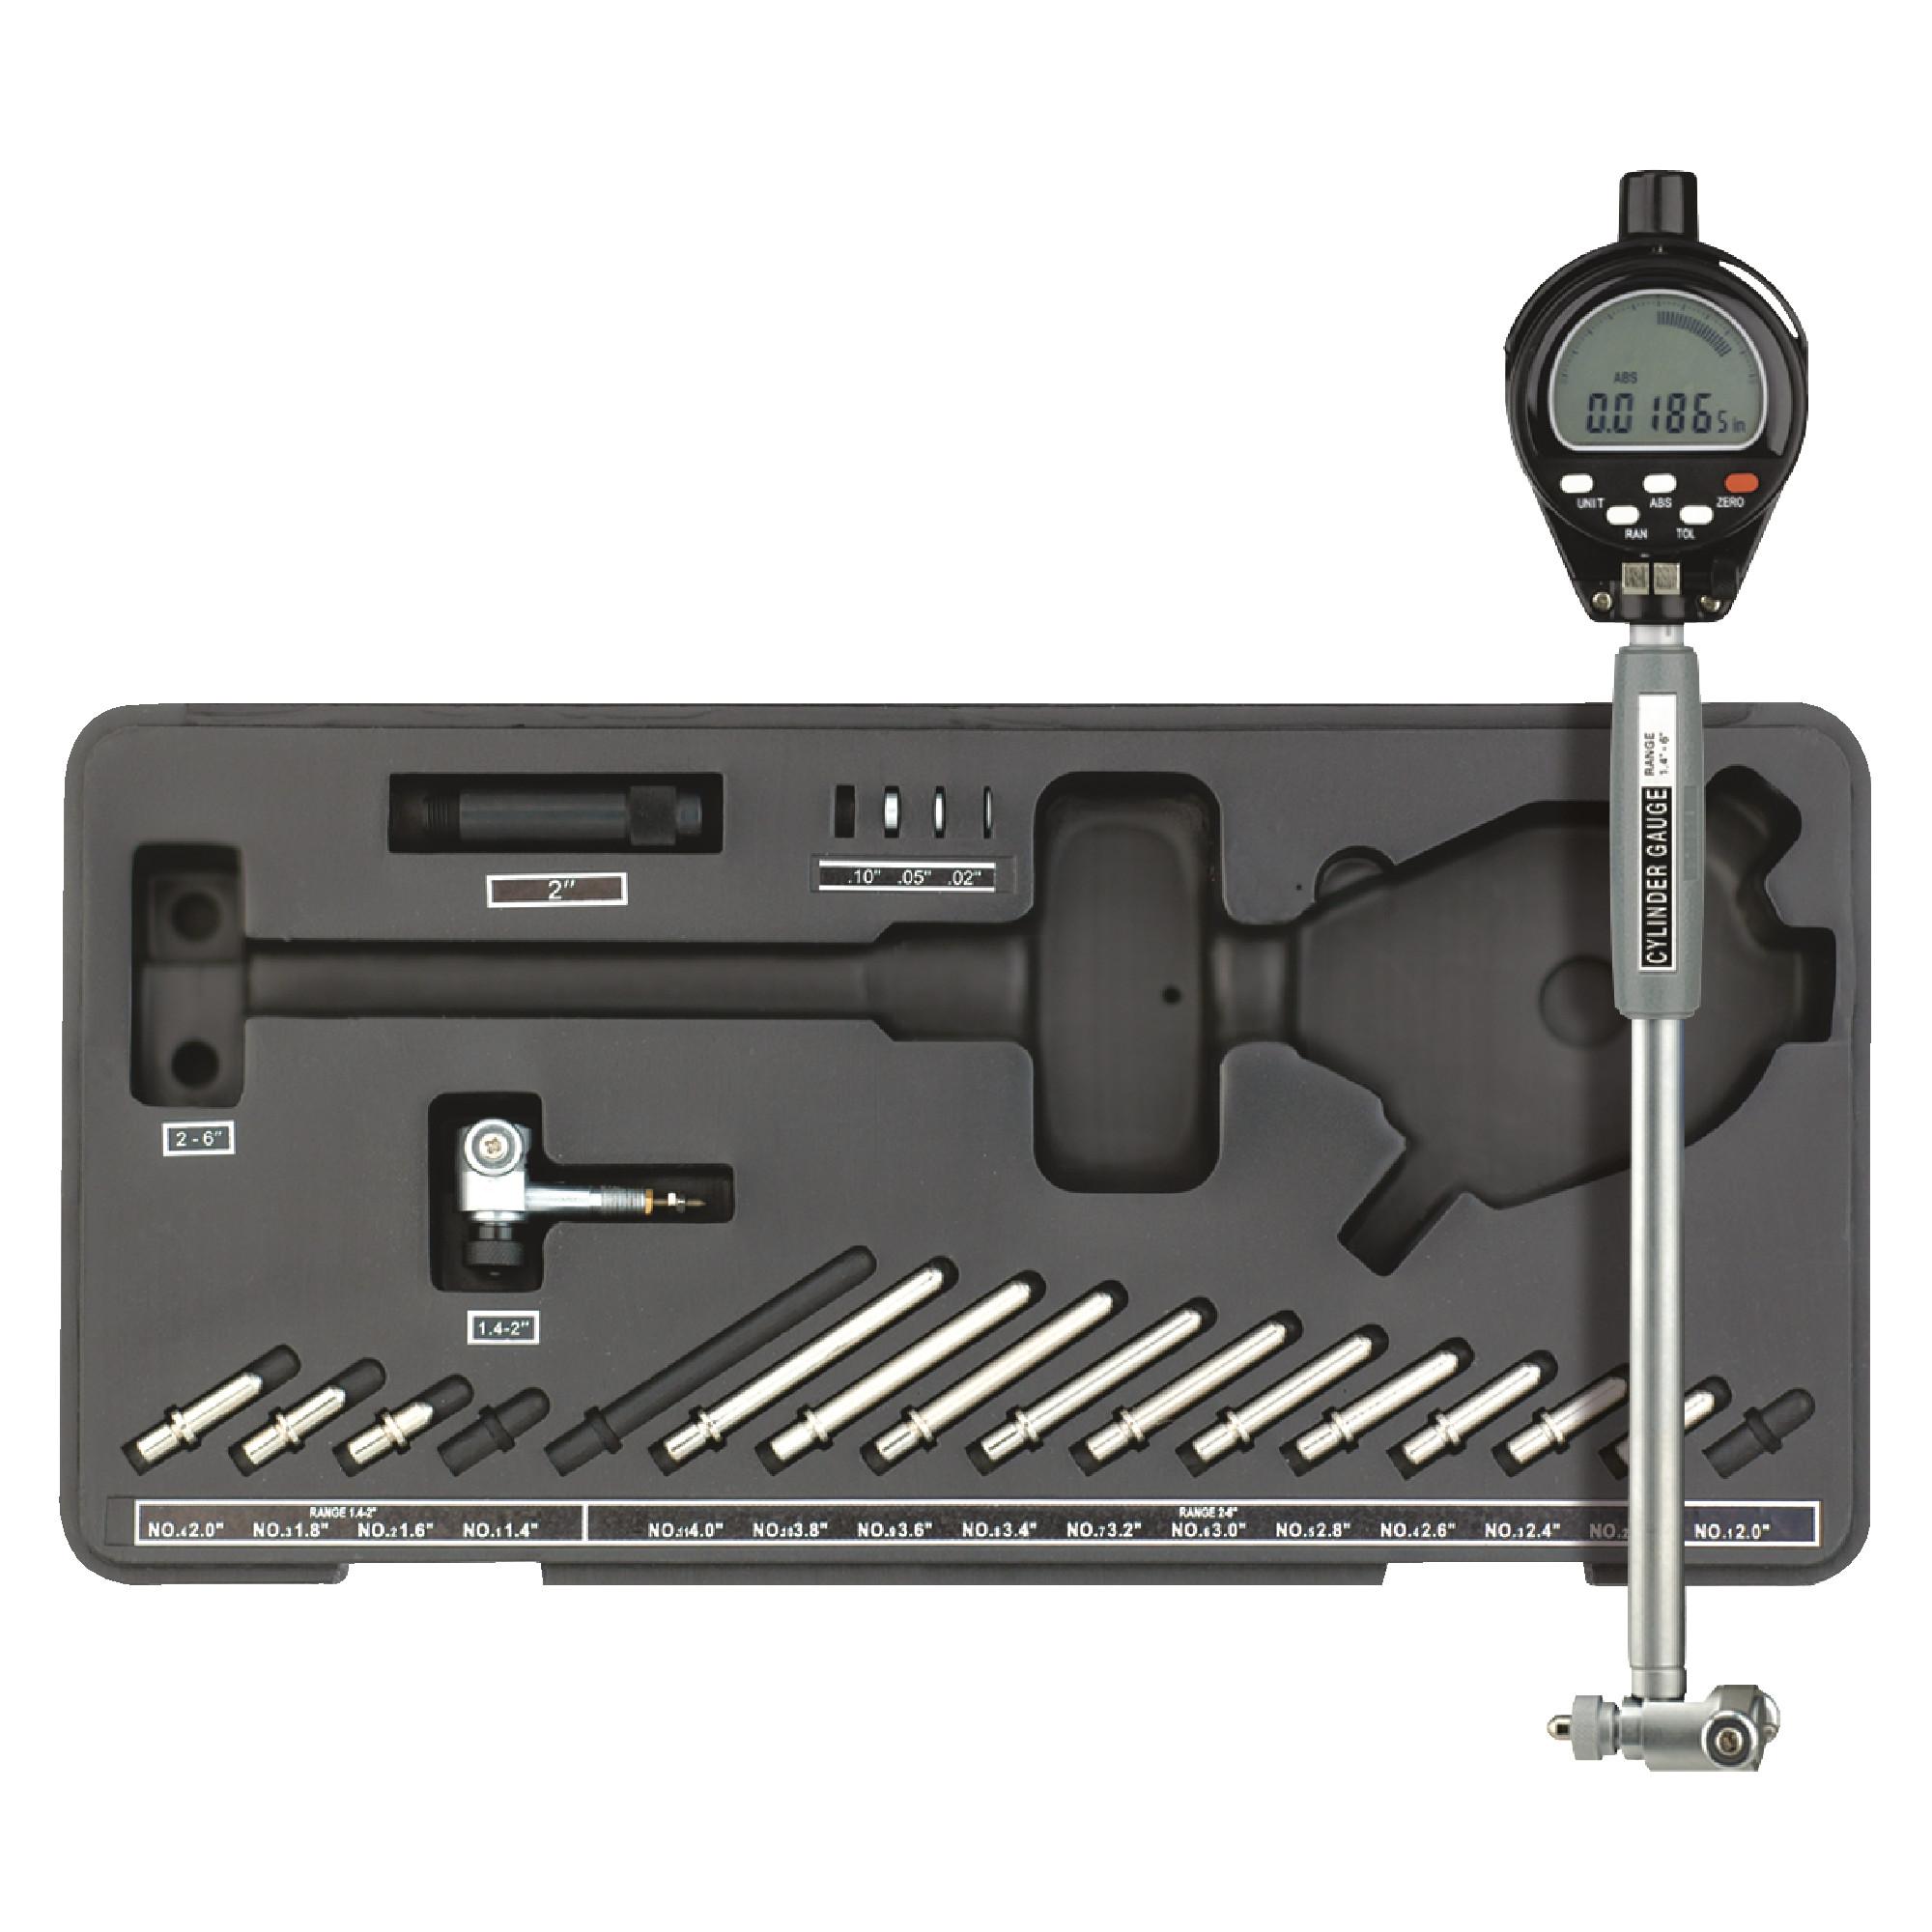 FOWLER - XT-E 1.4-6 Electronic Digital Bore Gage